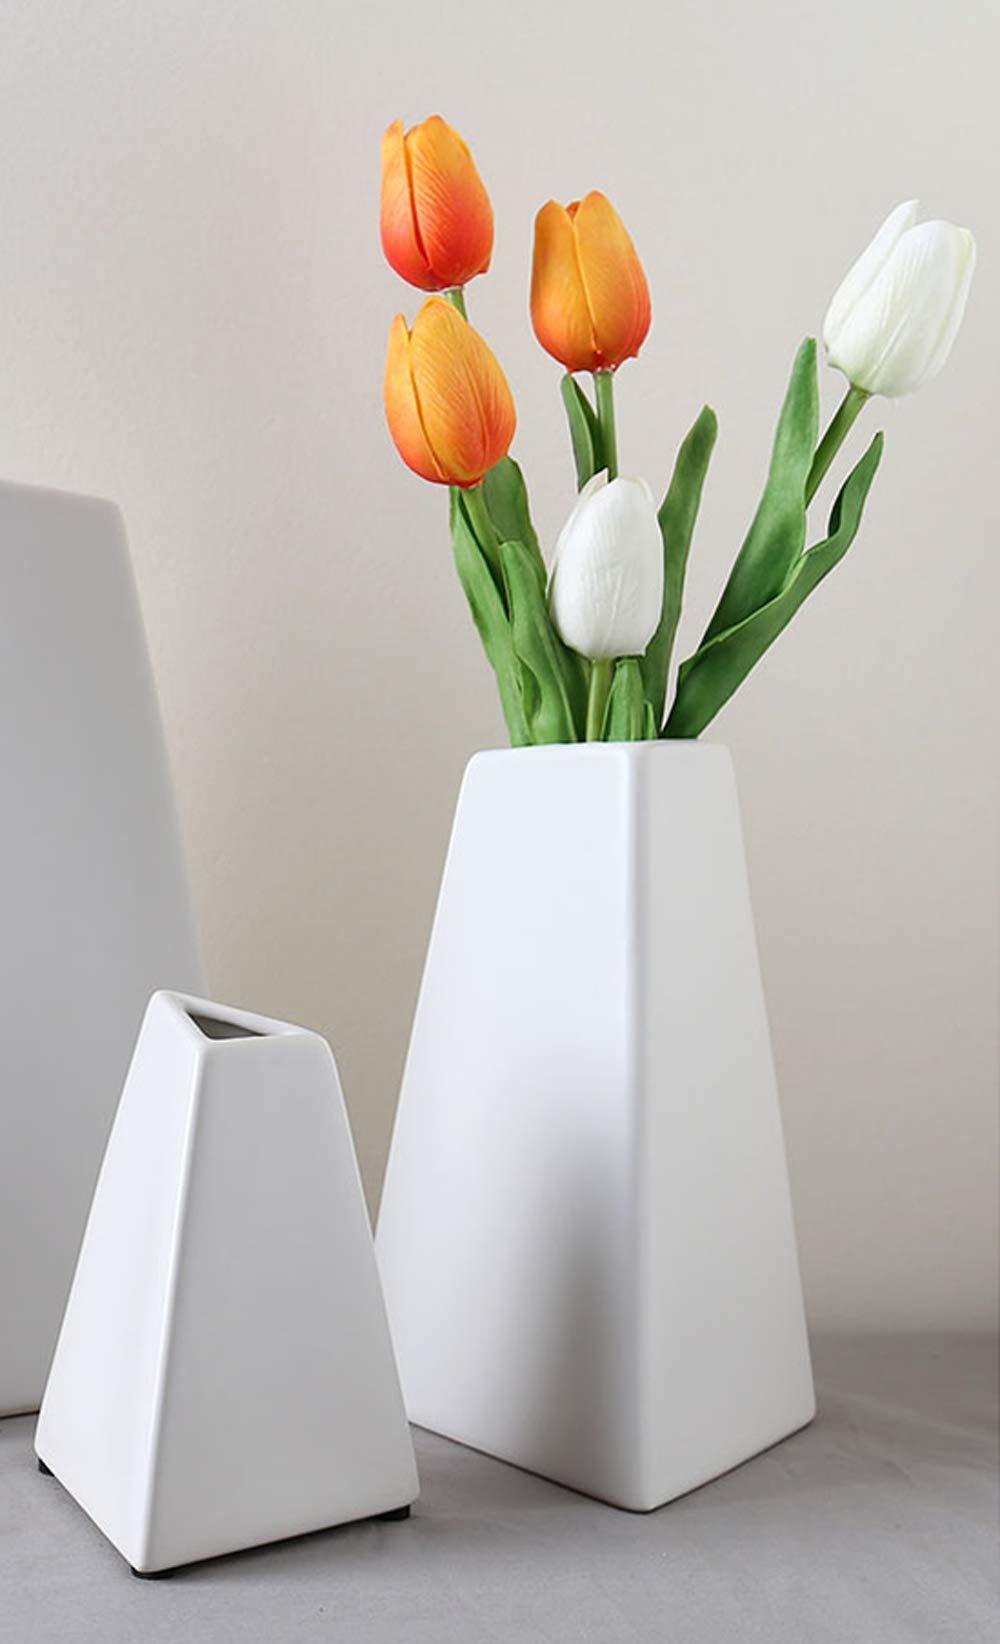 Moderne Chateau White Ceramic Geometric Vases for Flowers. Modern Pyramid Triangle Shape for Home  sc 1 st  Amazon.com & Modern Vase Set: Amazon.com